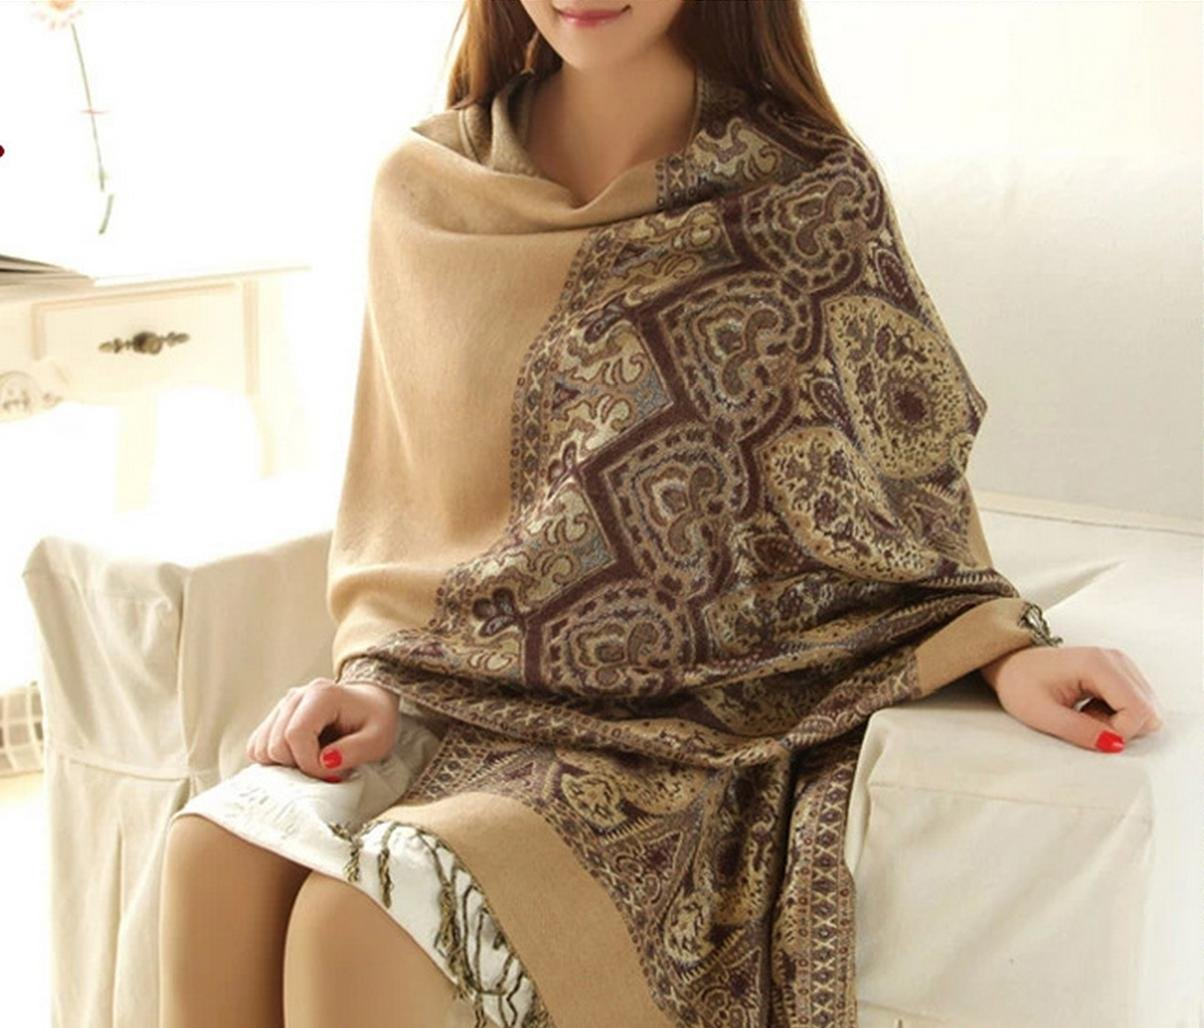 Onlineb2c Women's Woven Reversible Paisley Pashmina Shawl Wrap Camel by Onlineb2c (Image #1)